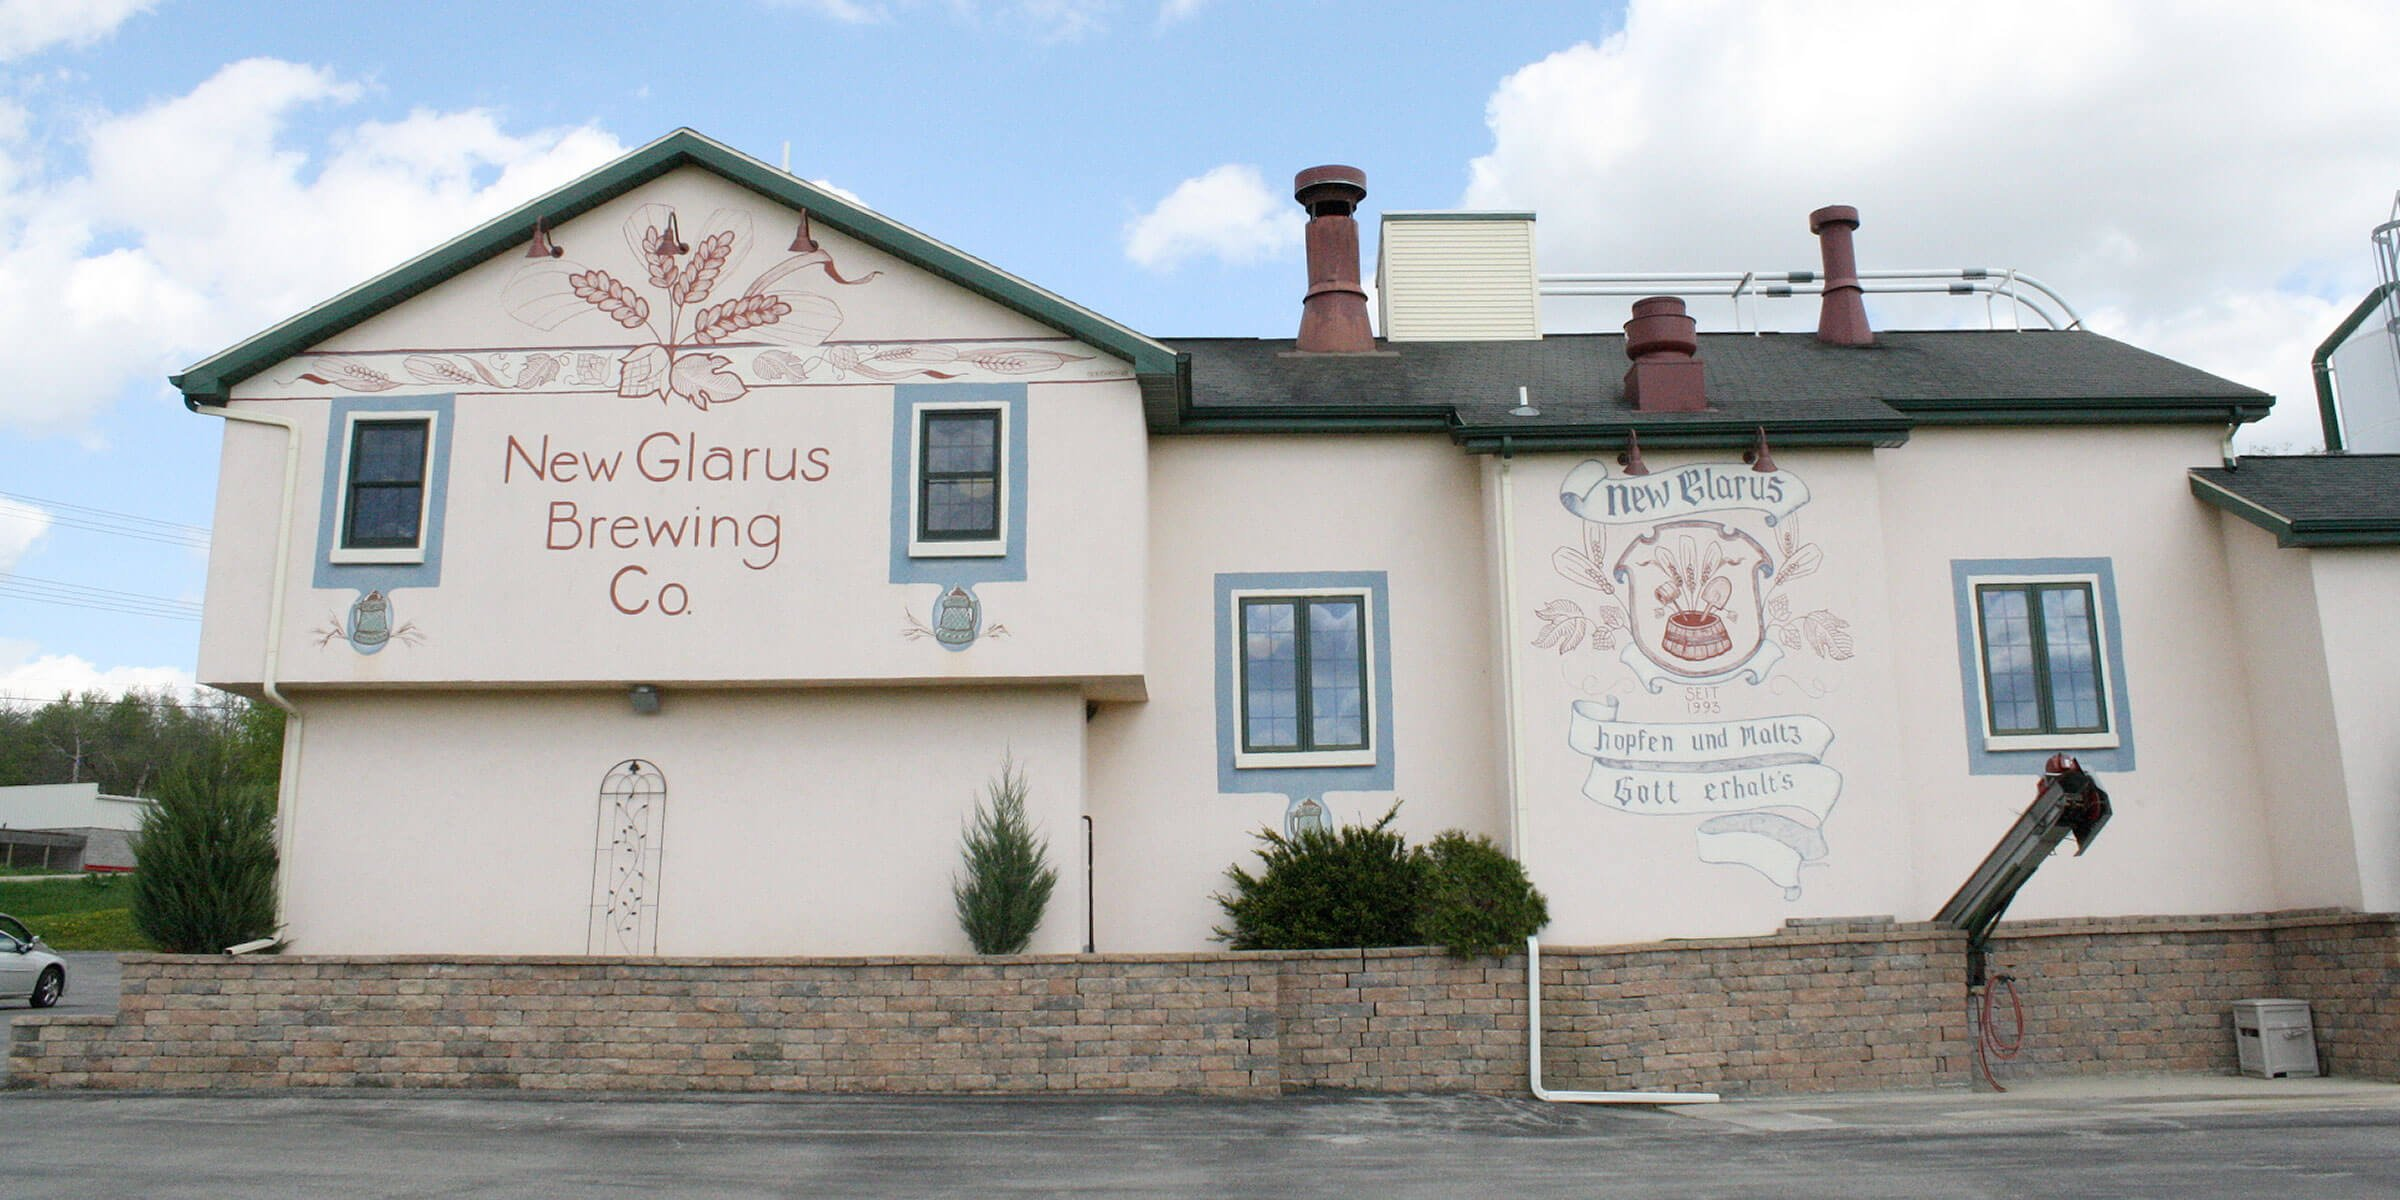 Outside New Glarus Brewing Company in New Glarus, Wisconsin